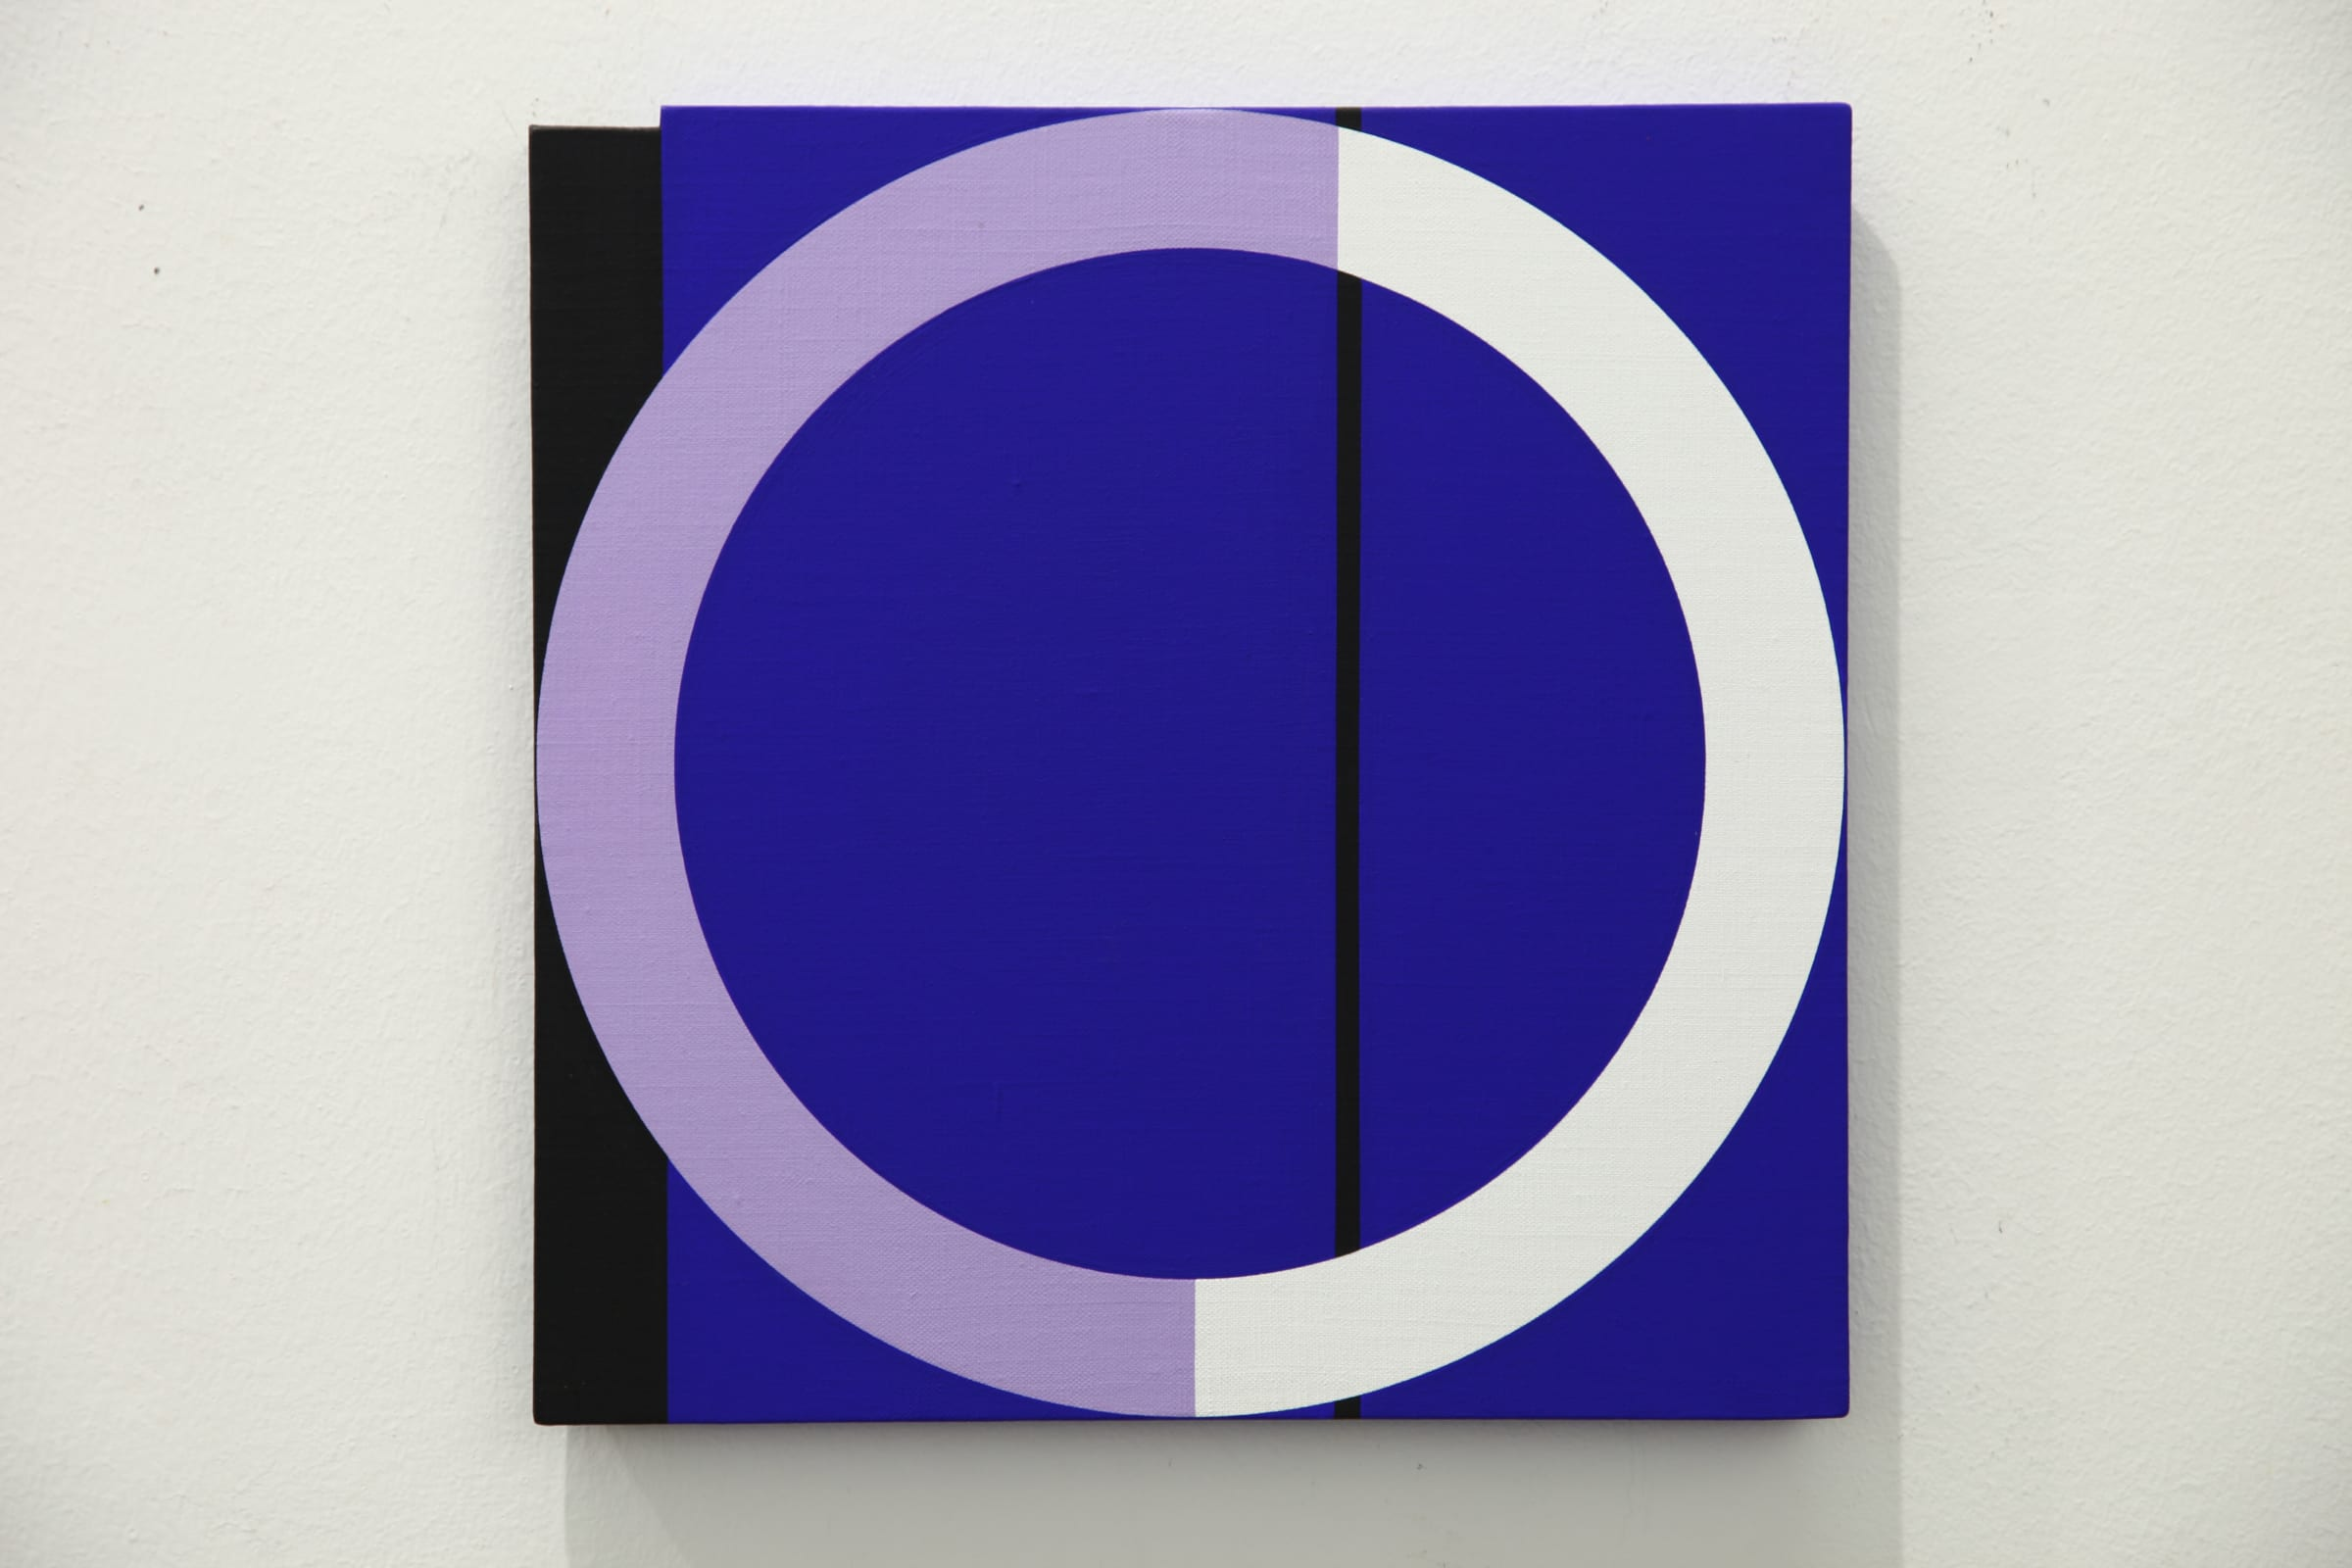 "<span class=""link fancybox-details-link""><a href=""/artists/30-giuliano-barbanti/works/299-giuliano-barbanti-anello-849-2003/"">View Detail Page</a></span><div class=""artist""><strong>Giuliano Barbanti</strong></div> <div class=""title""><em>Anello 849</em>, 2003</div> <div class=""medium"">acrilico su tela</div> <div class=""dimensions"">cm 35x35</div>"